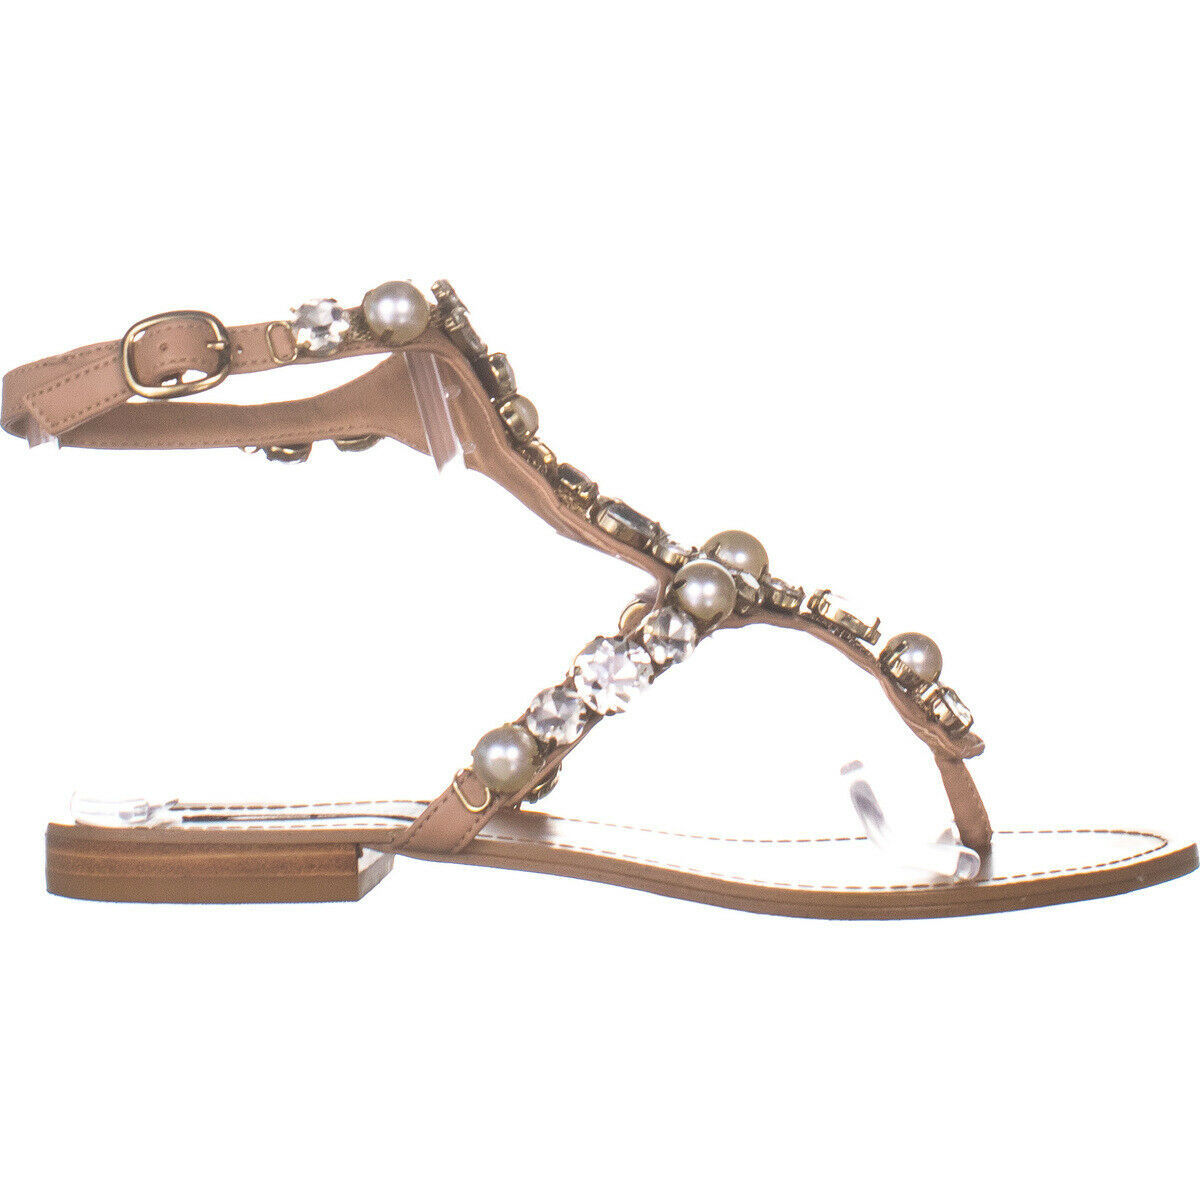 Steve Madden Chantel Flat Ankle Strap Sandals, Blush Multi 115, Blush Multi, 7 image 5